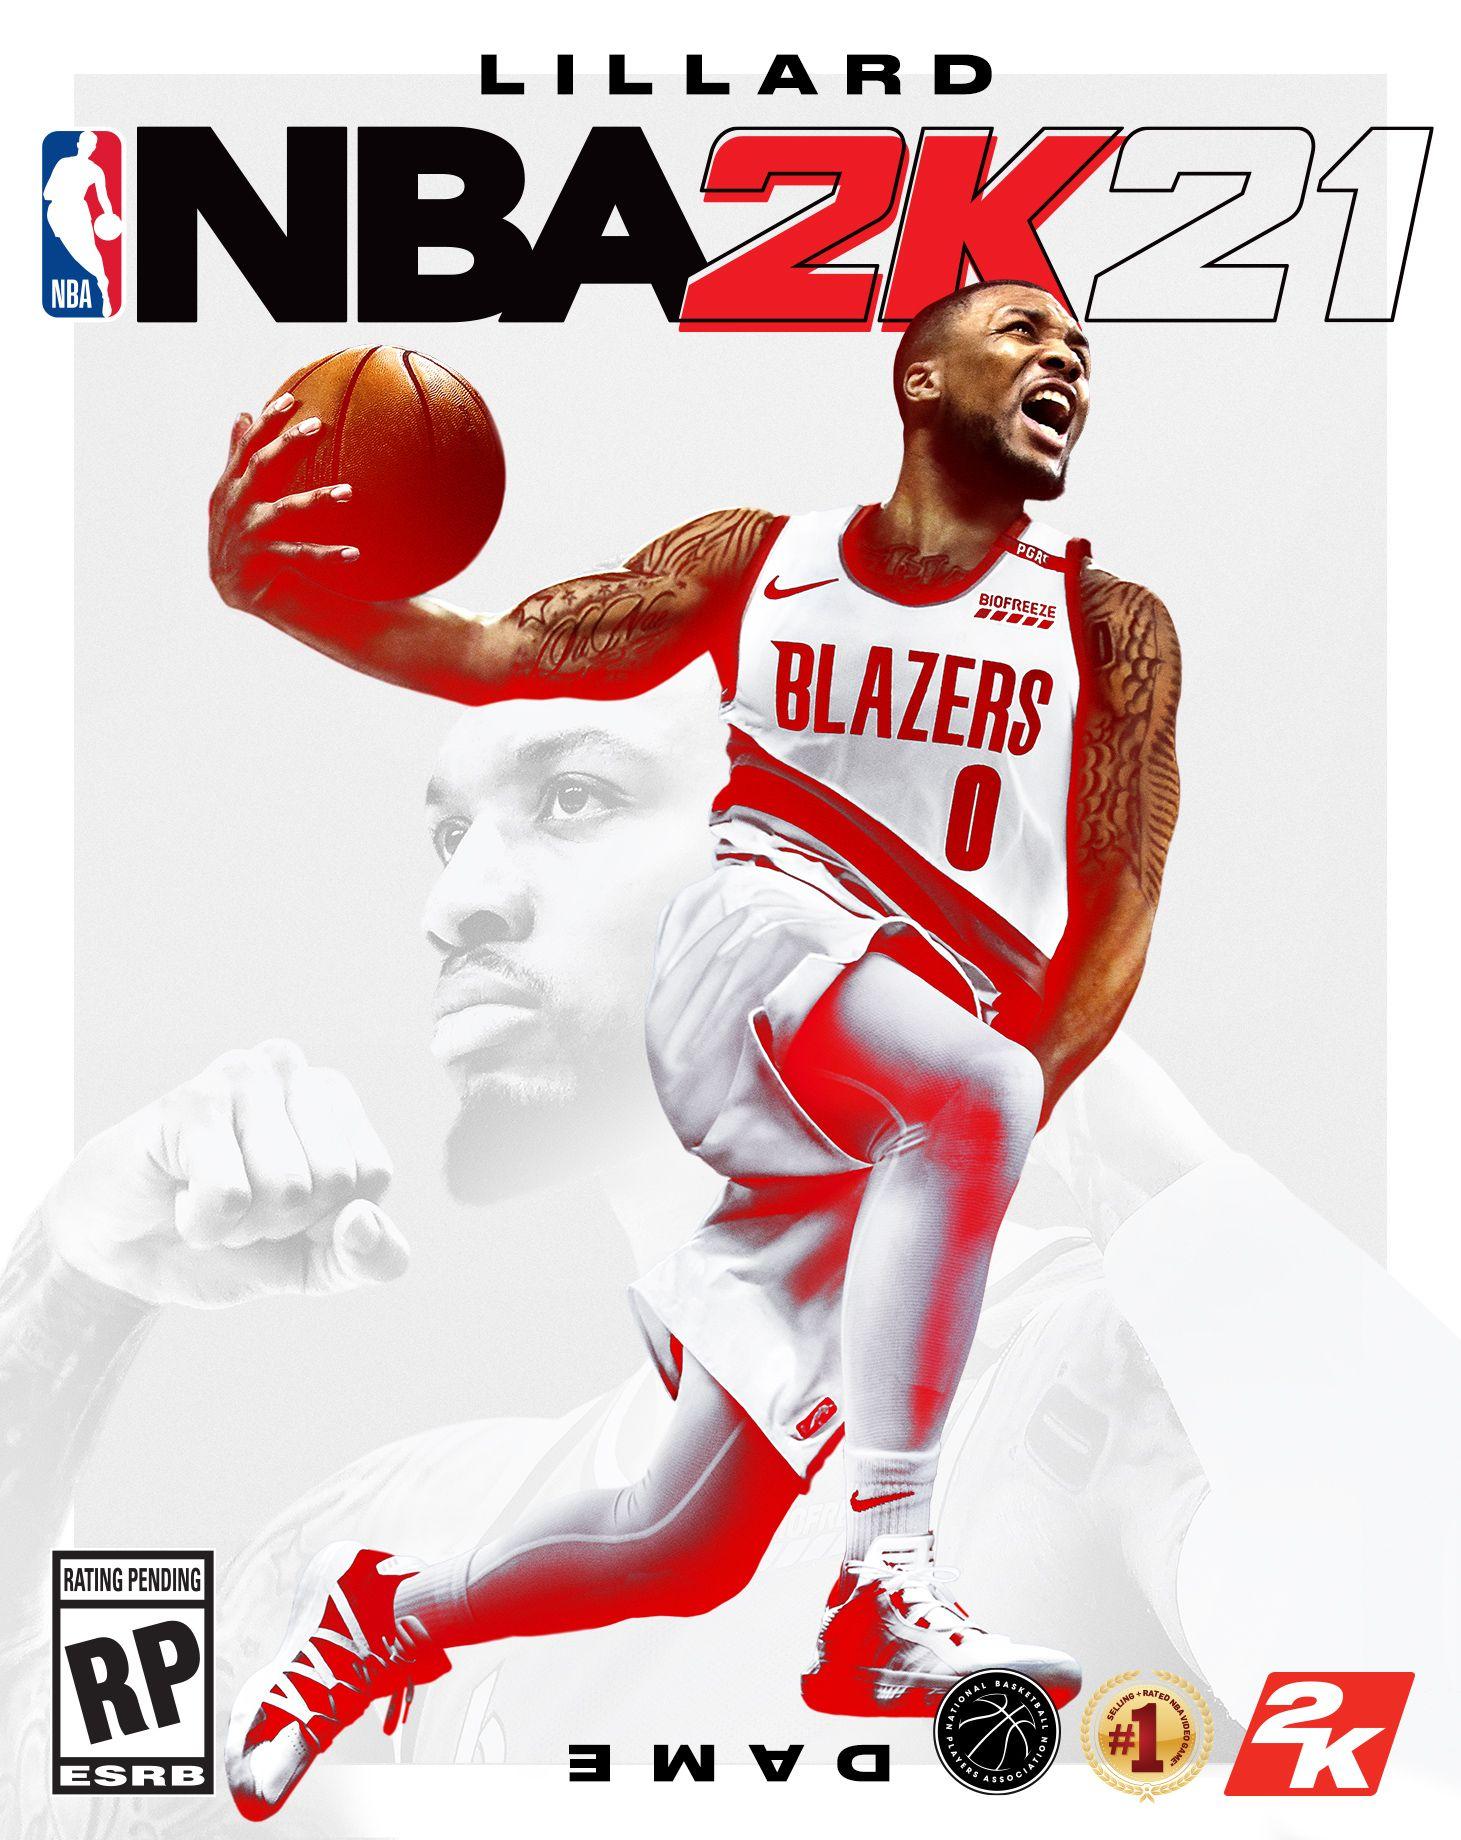 NBA 2K21 Reveals Damian Lillard As First Cover Star 1